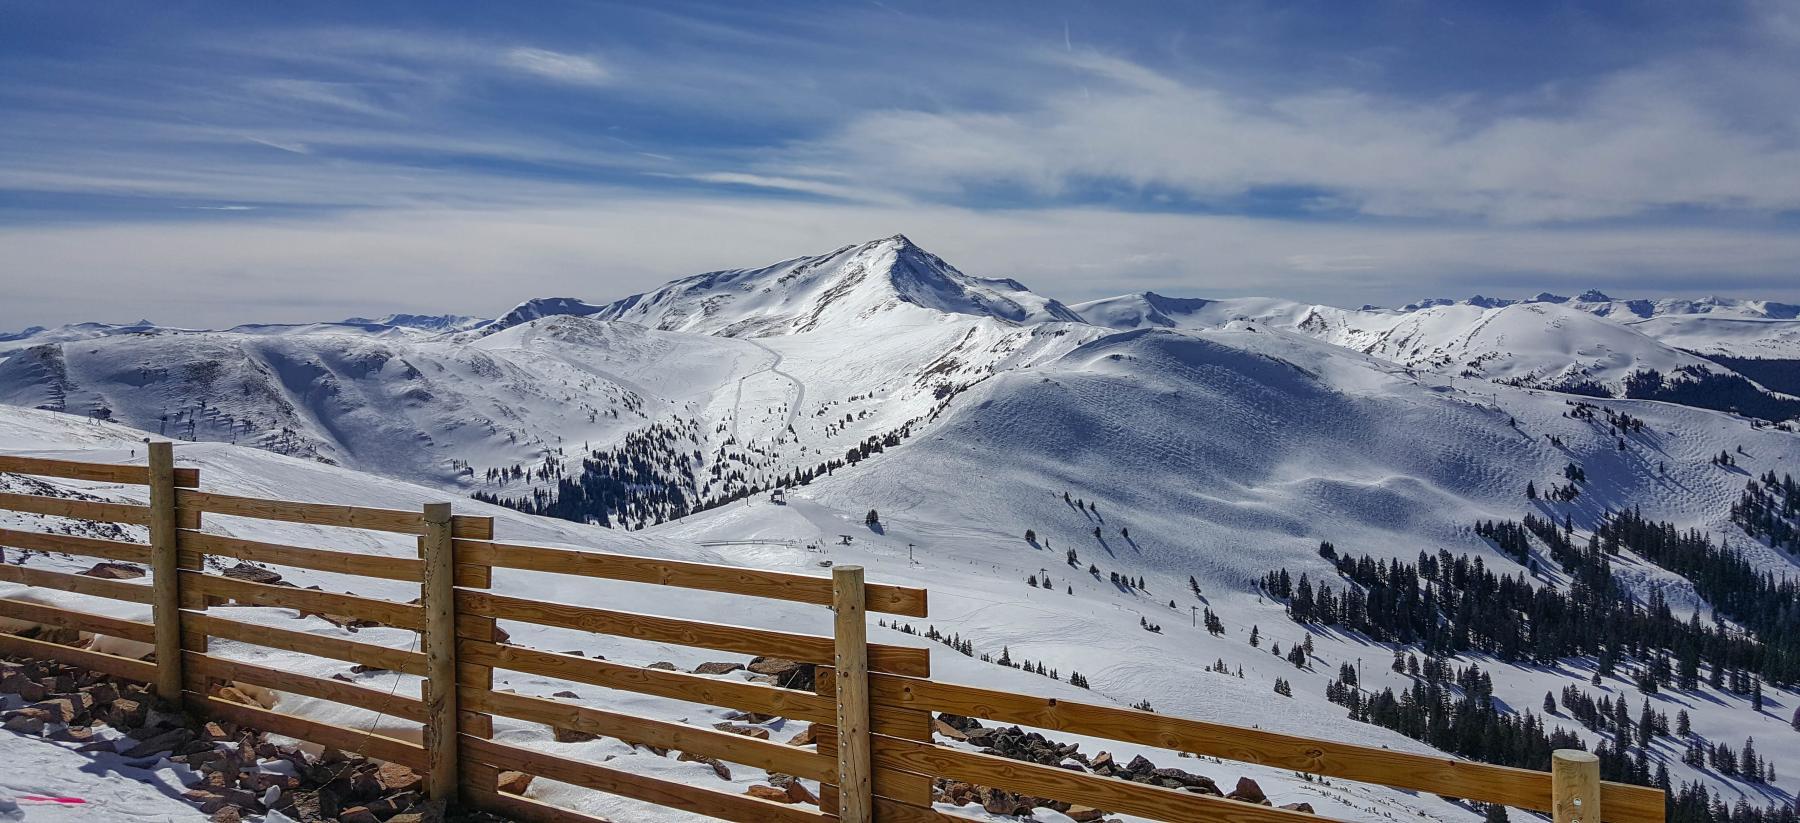 Copper Mountain, Copper Bowl and Union Bowl